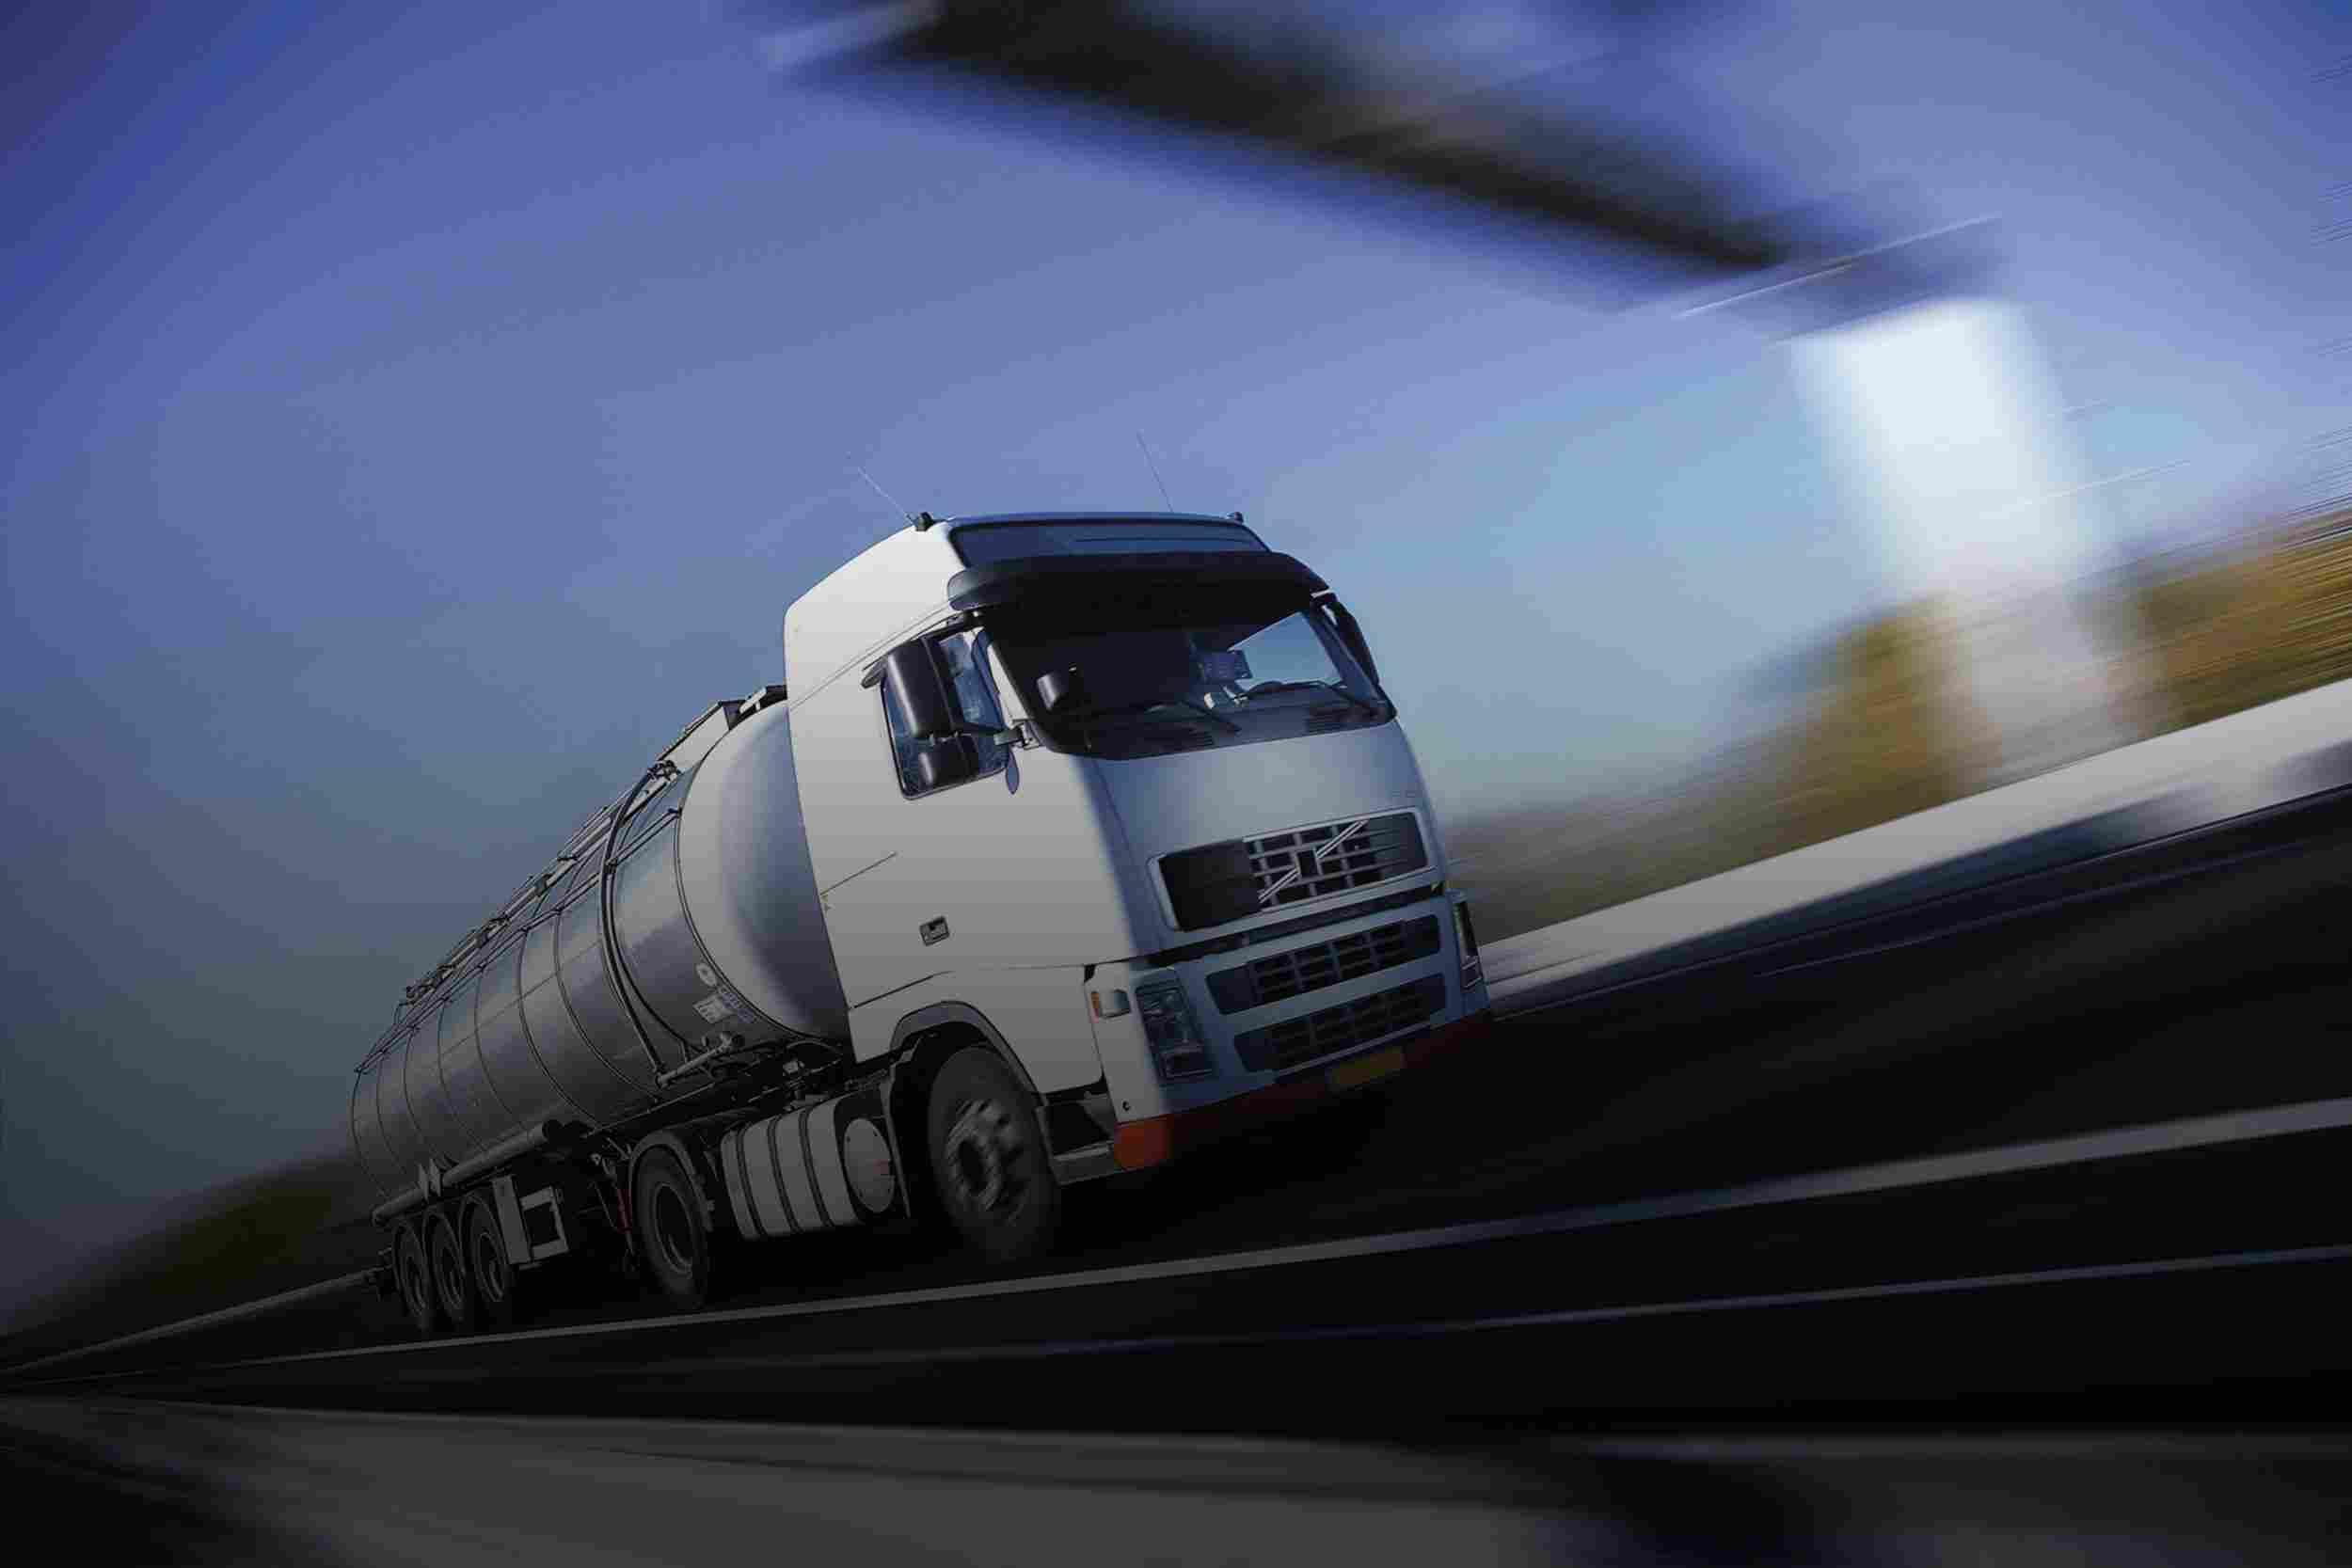 https://miratrans.ro/wp-content/uploads/2015/09/White-Truck-single.jpg